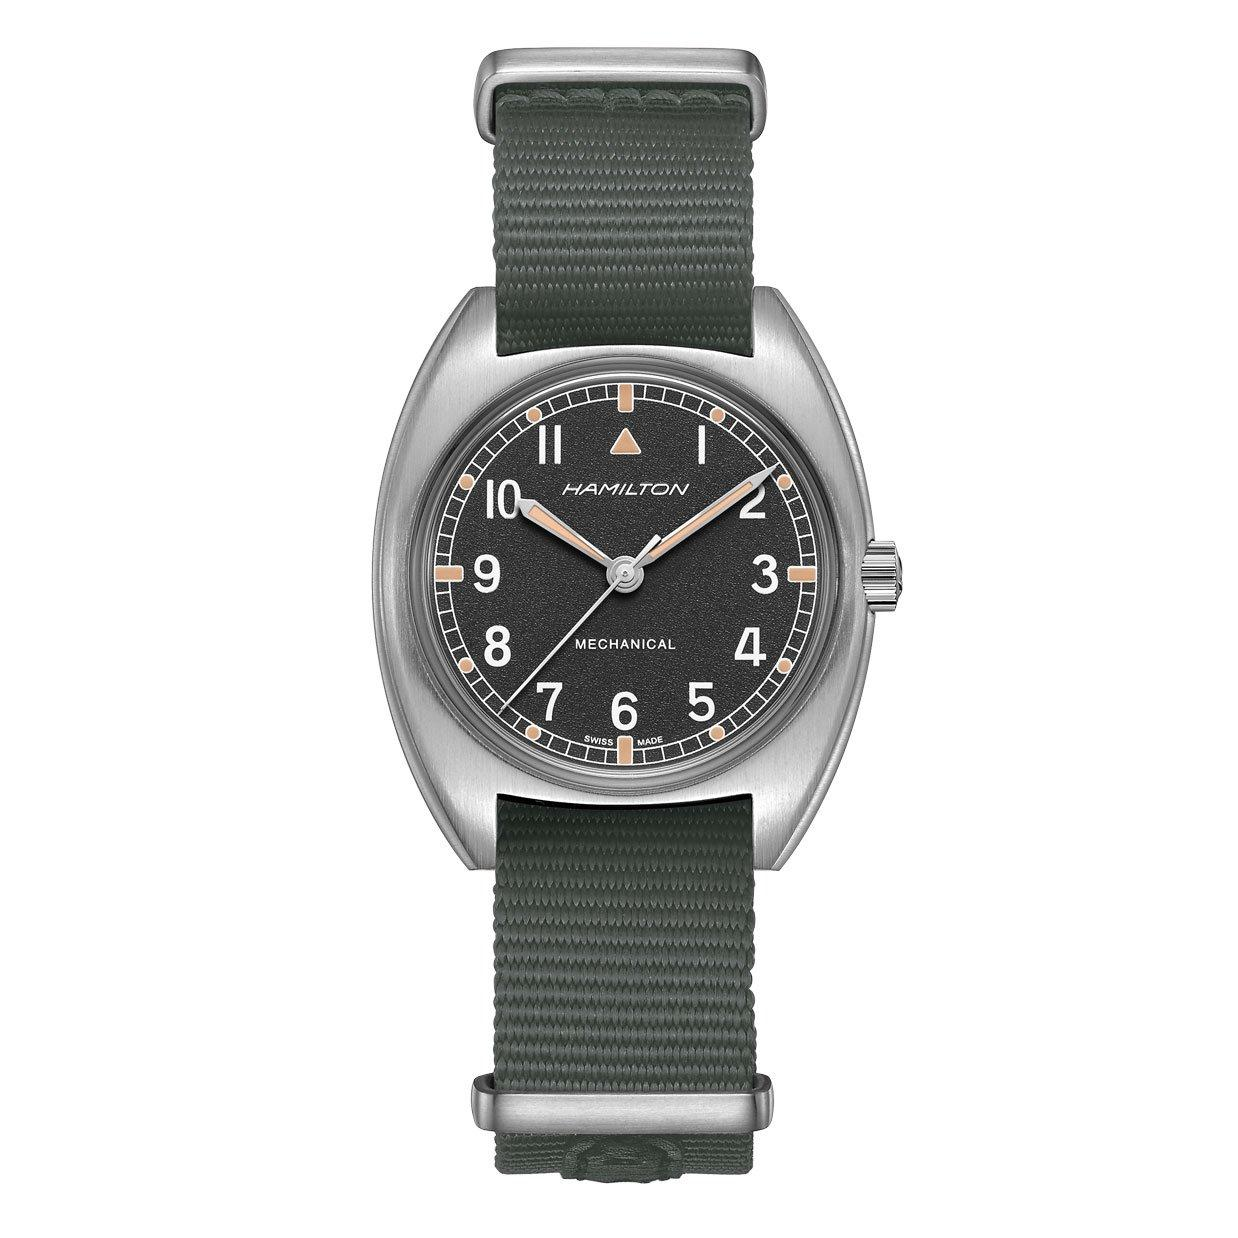 Hamilton Khaki Pilot Pioneer Mechanical Men's Watch